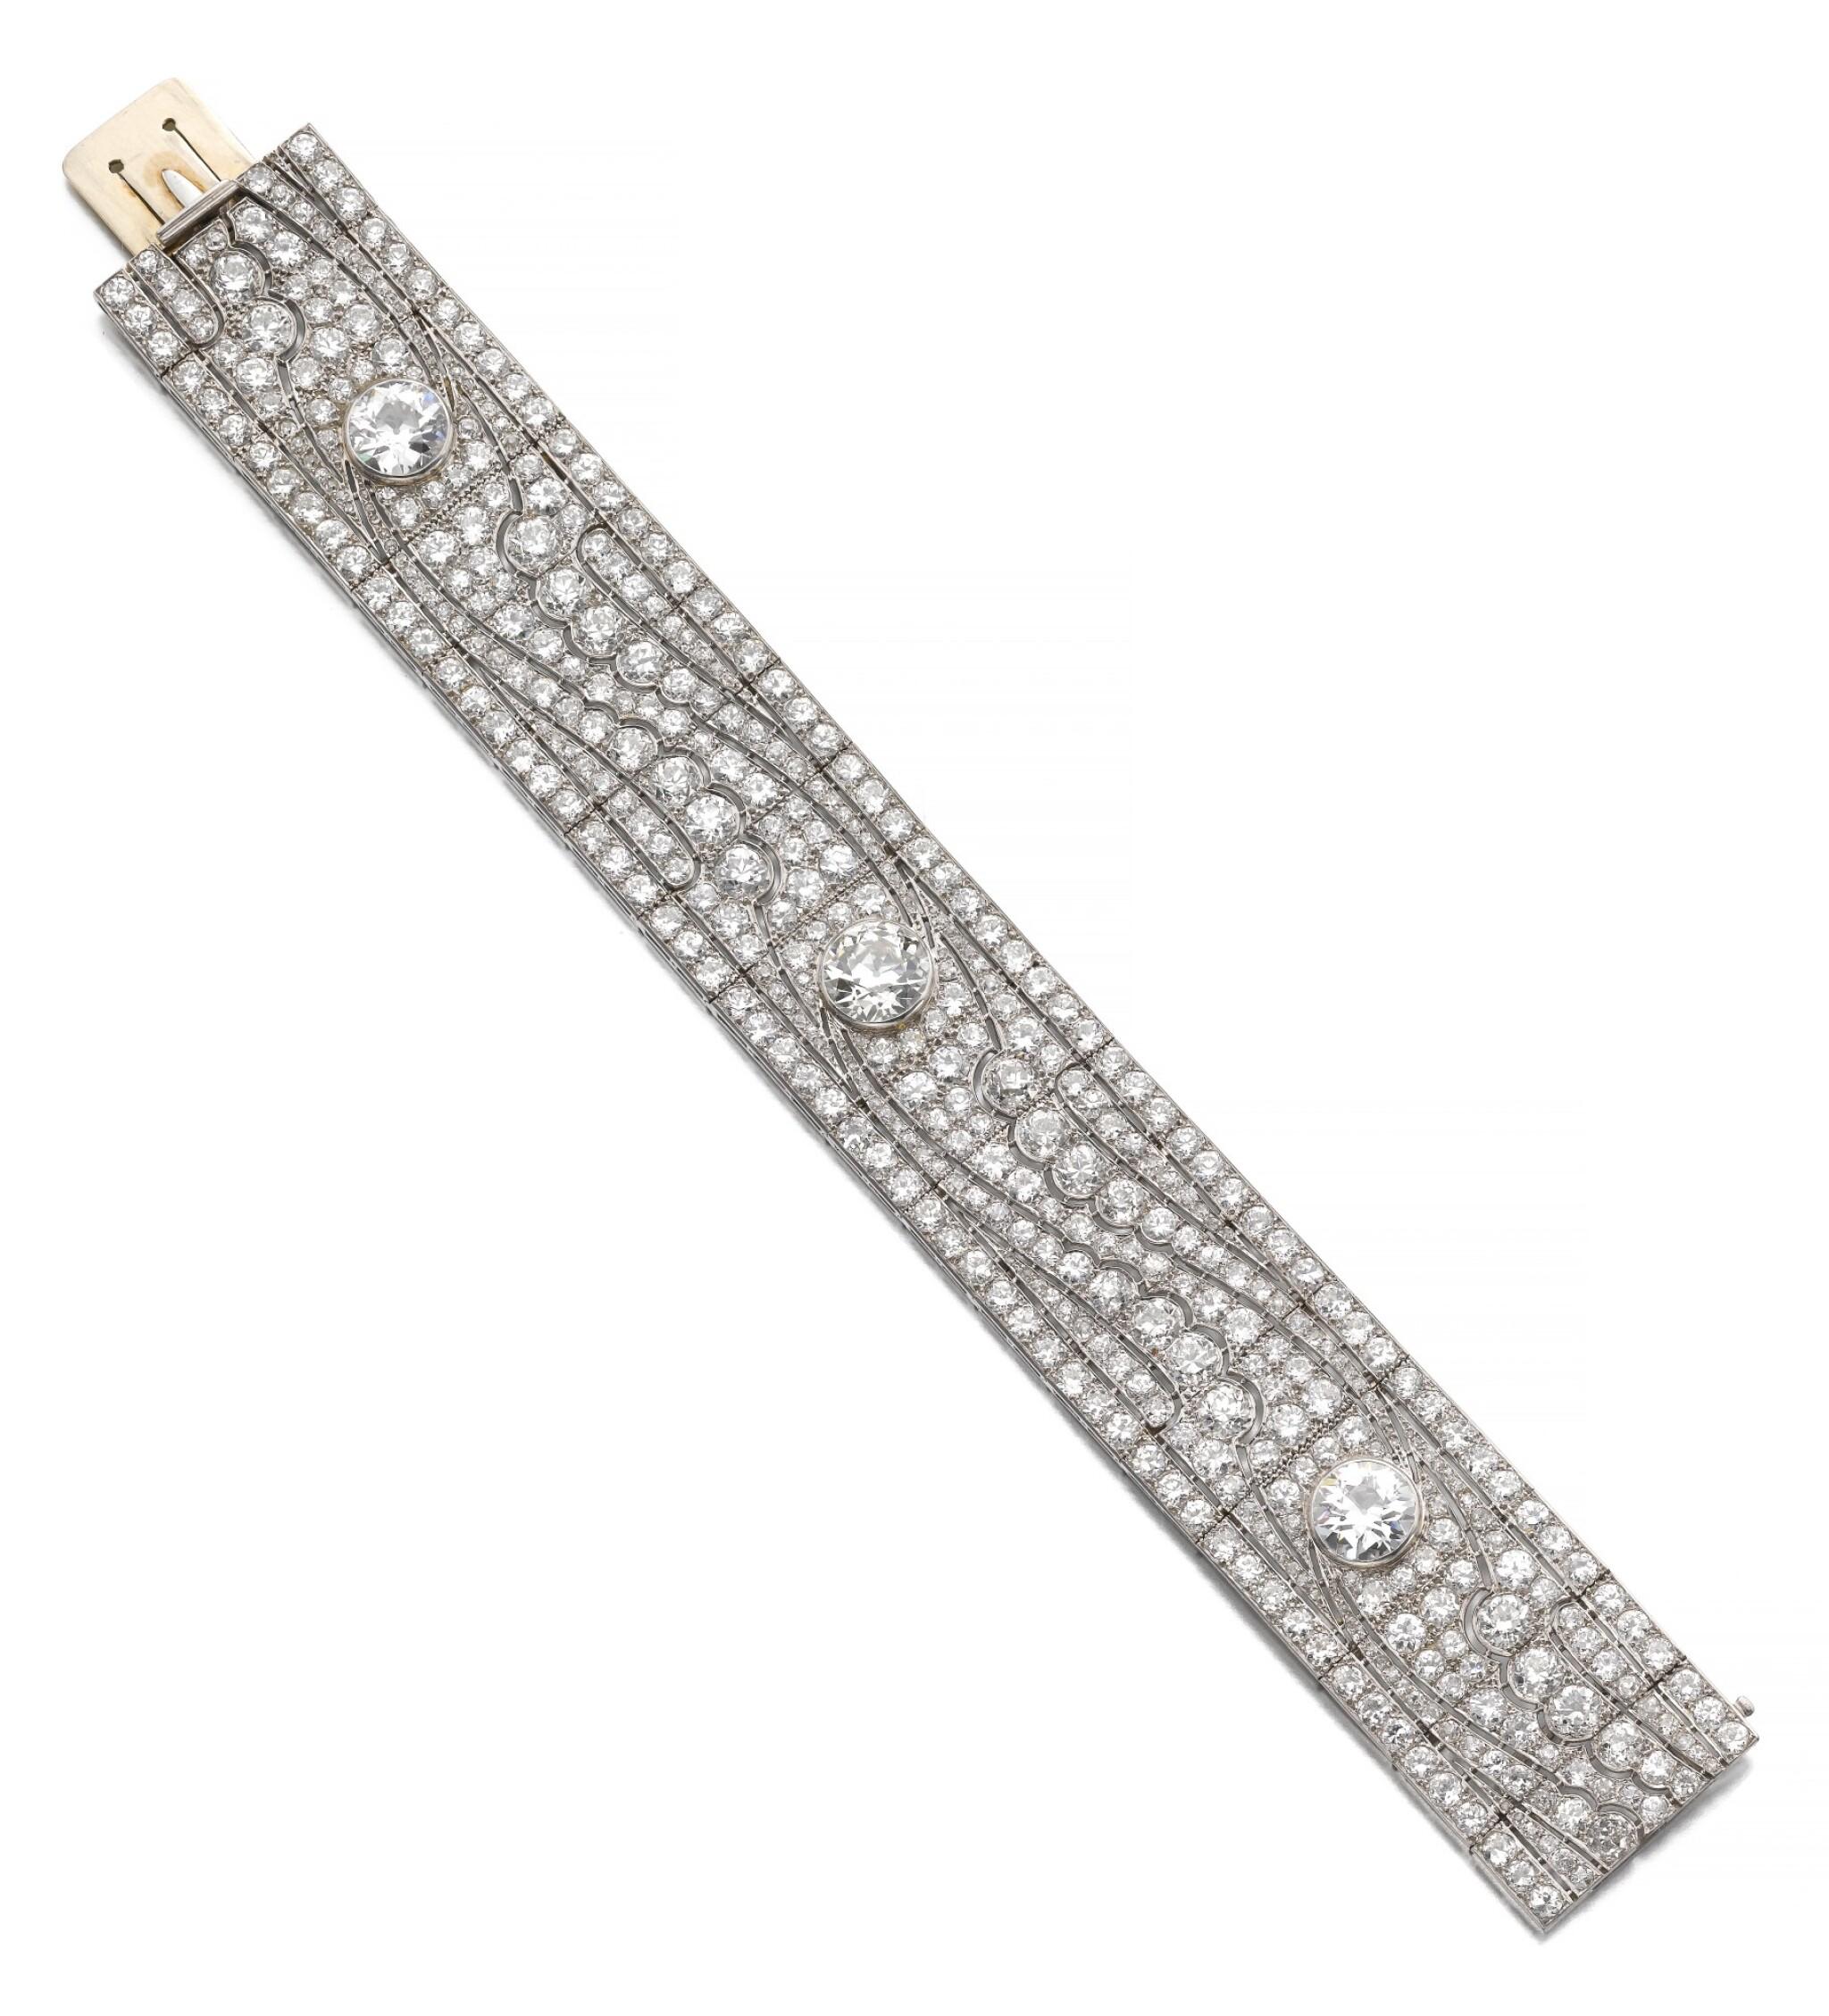 View full screen - View 1 of Lot 602. Diamond bracelet, 1930s   鑽石手鏈, 1930年代.